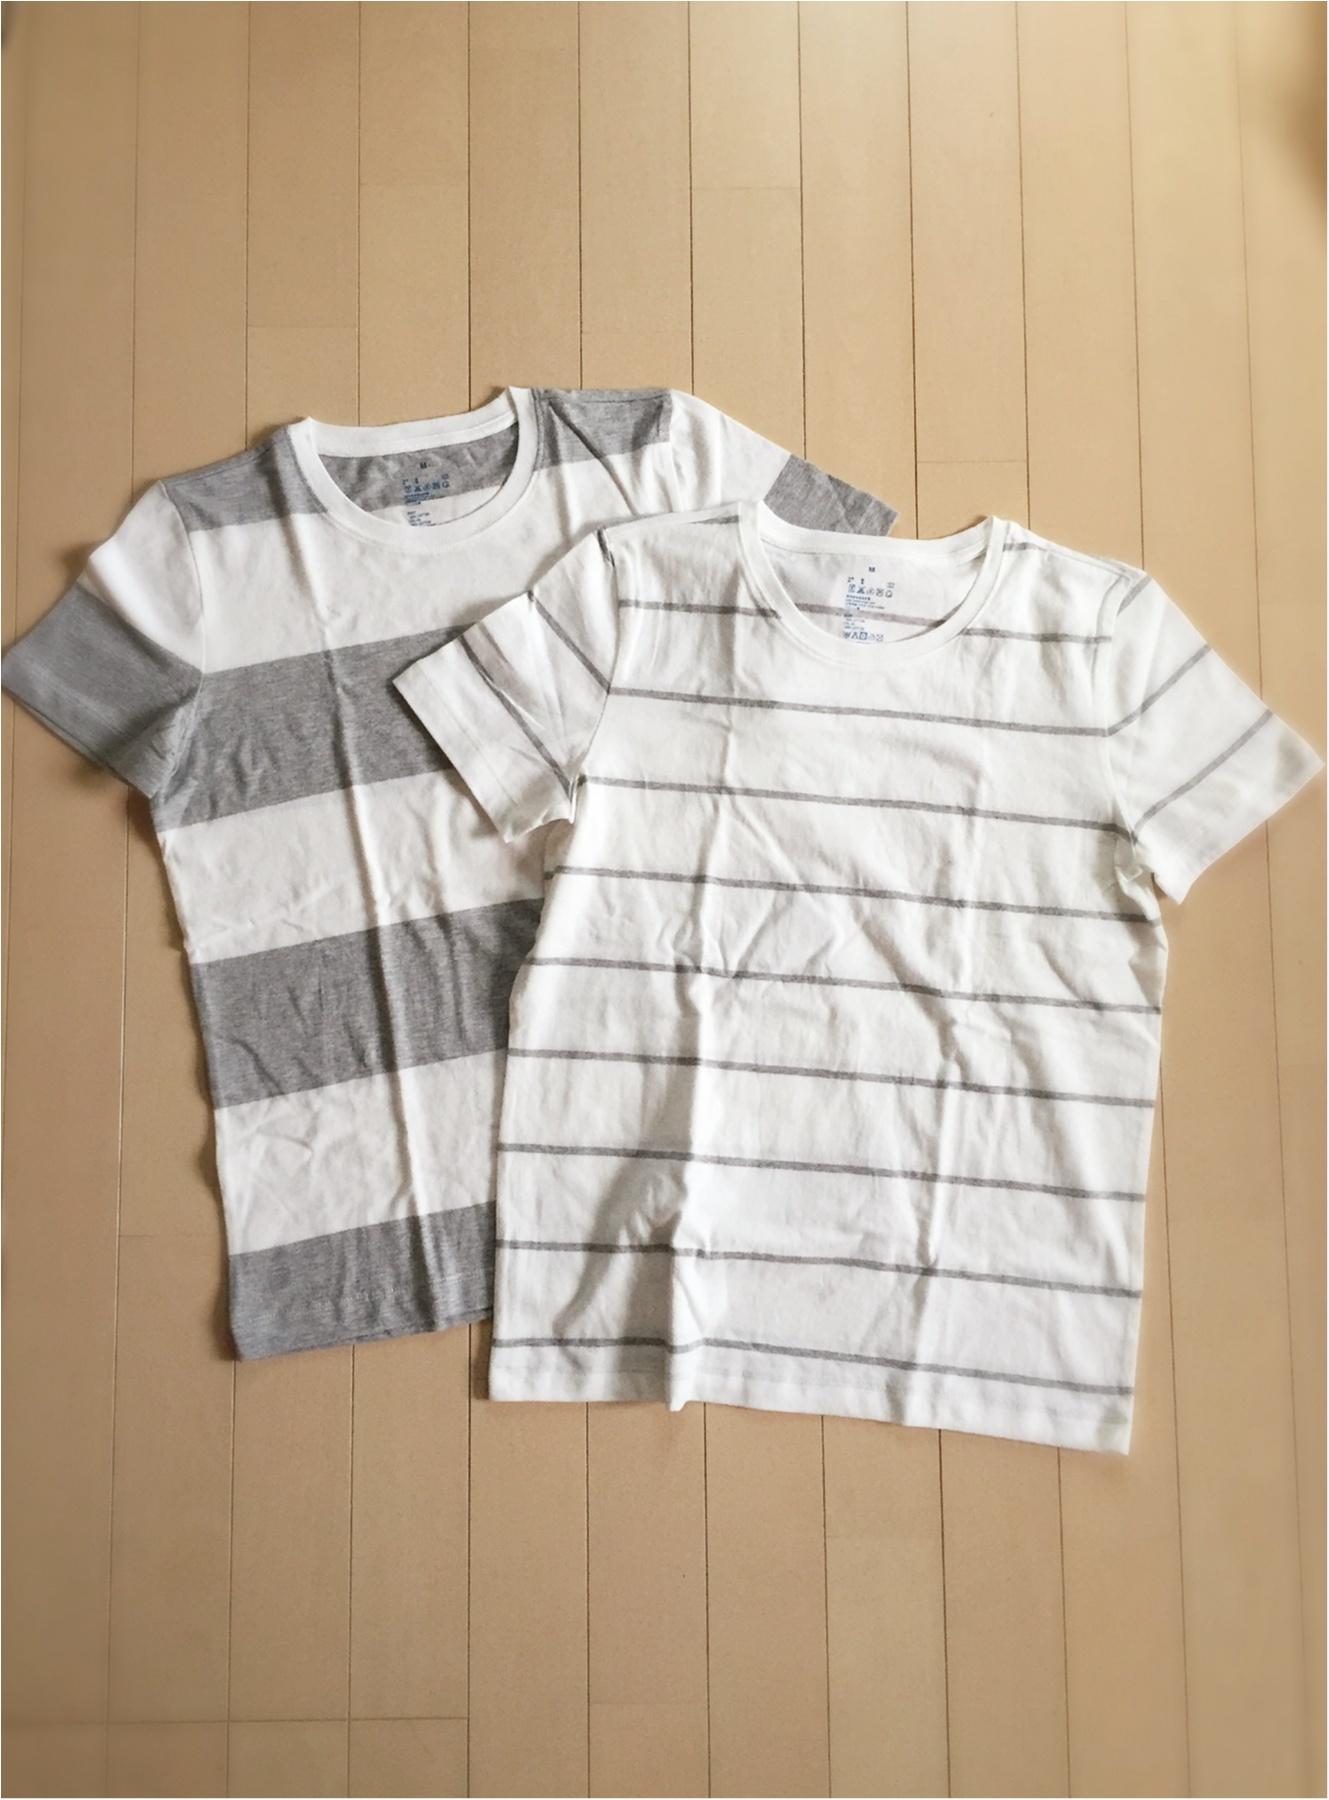 LUMINEのセールで無印良品に寄ると、 オーガニックコットンのTシャツが2枚買うと更に割引にっっ!!!こういう時でないと安く買えないので、グレー ボーダーを色違いで2枚 ...